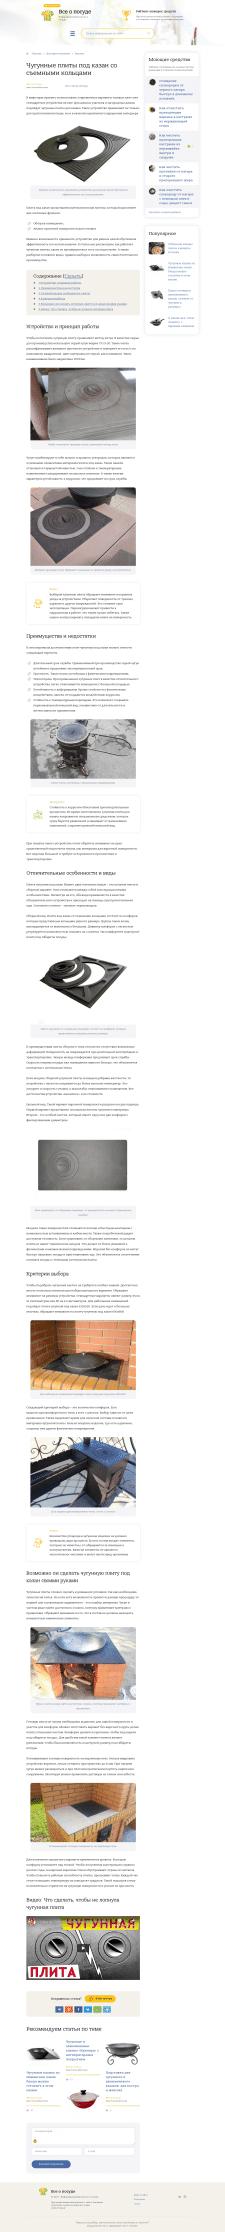 Чугунная плита под казан: особенности и принцип ра